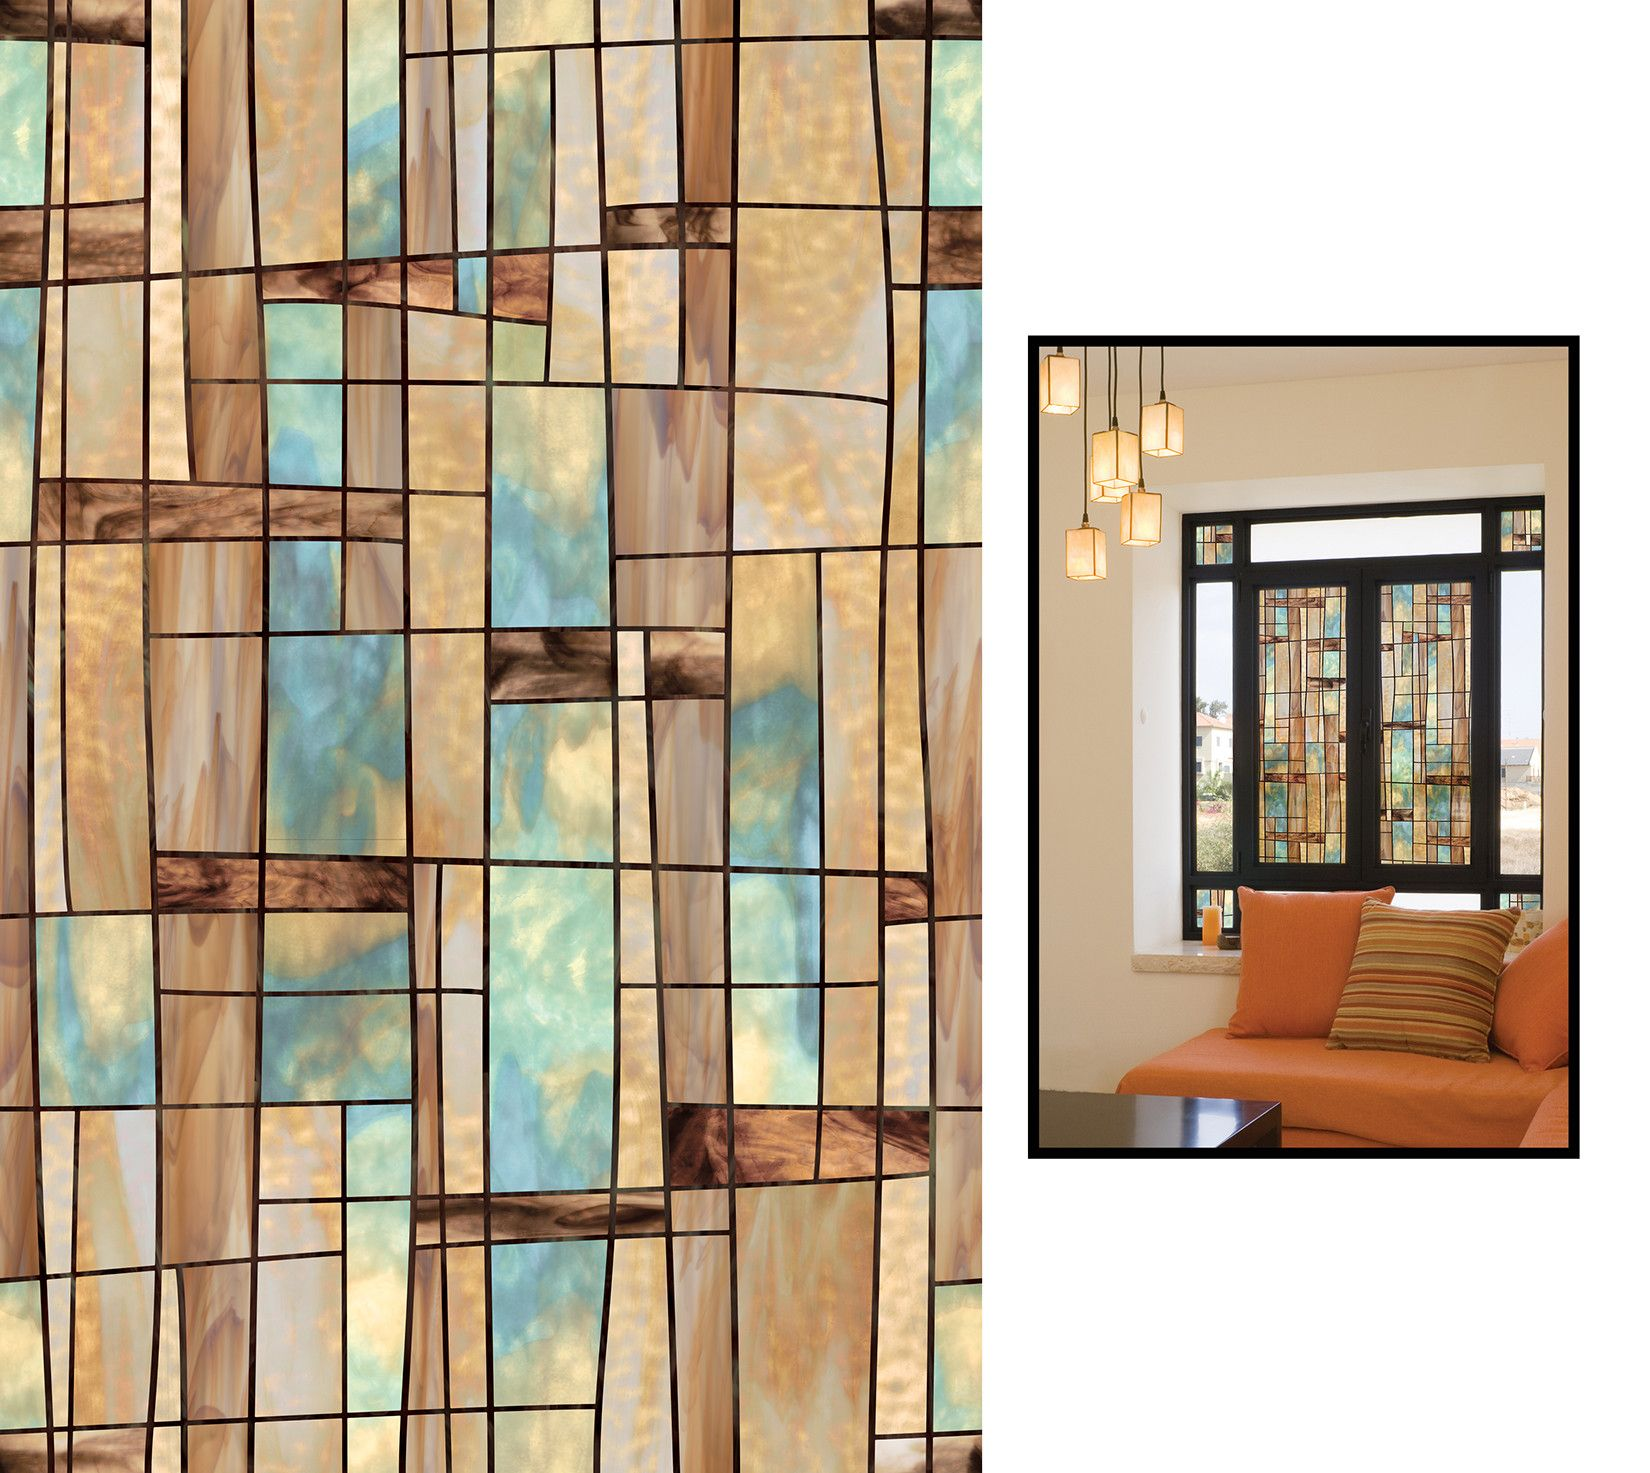 "Decorative Windows For Homes: Artscape 24"" X 36"" Decorative City Lights Window Film"